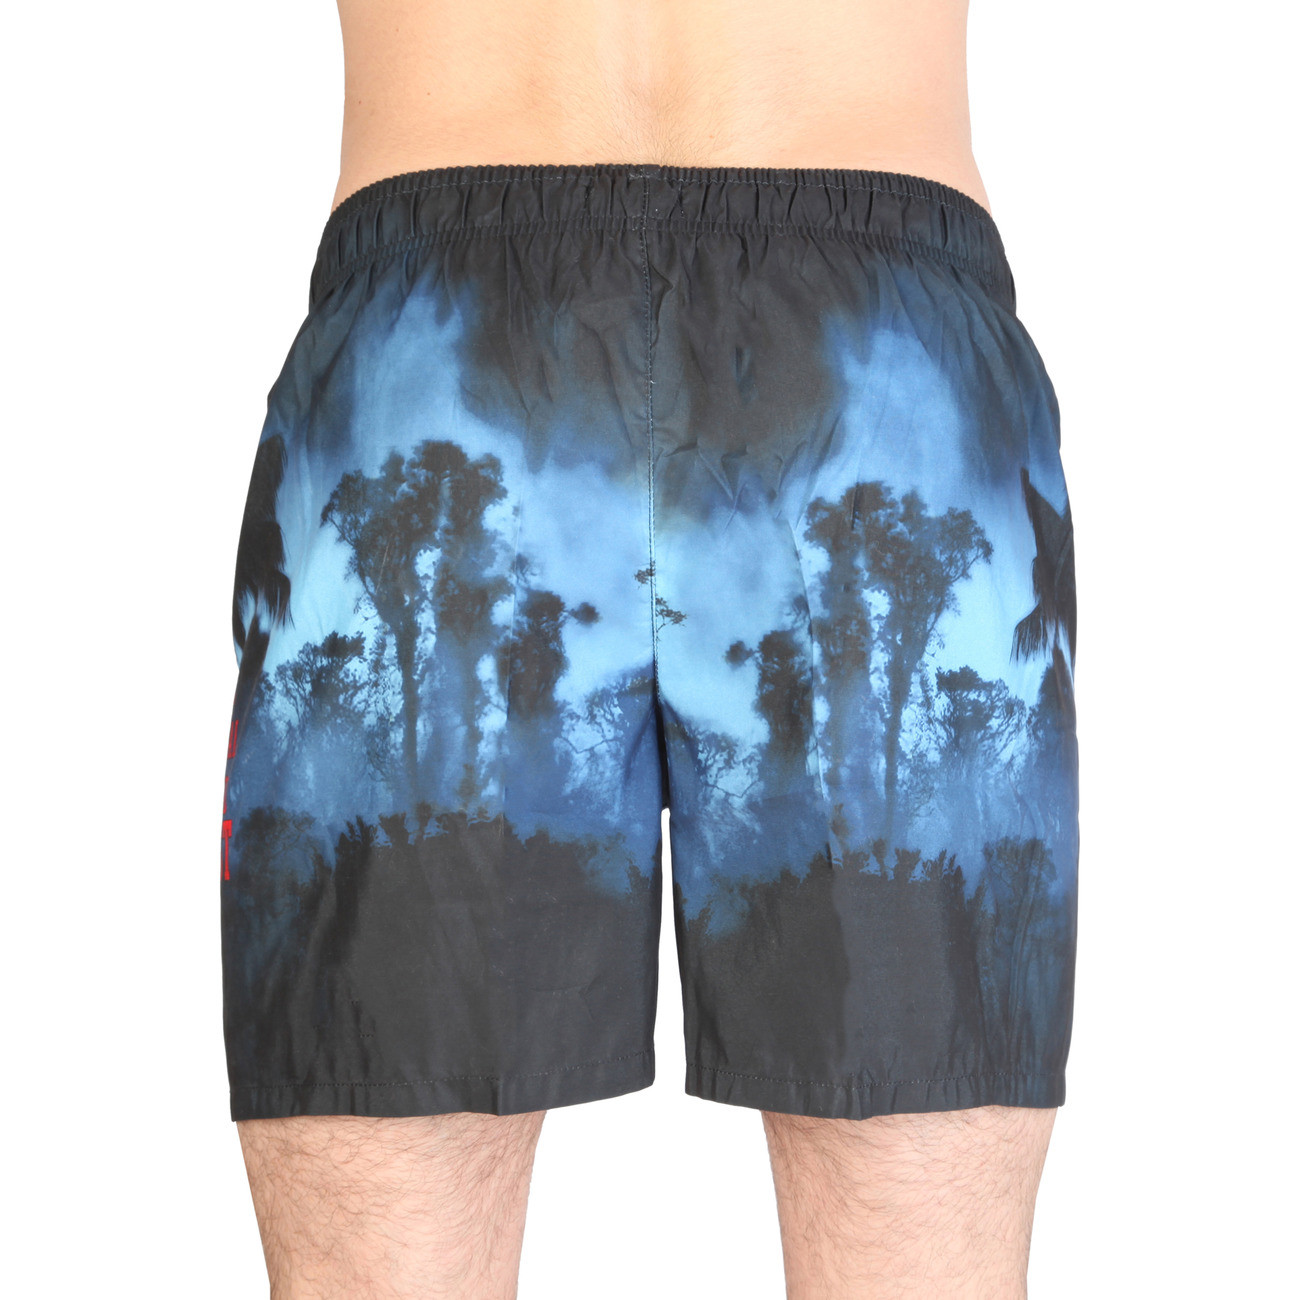 2409eb84c2 Just Cavalli Mens Summer Beachwear Shorts